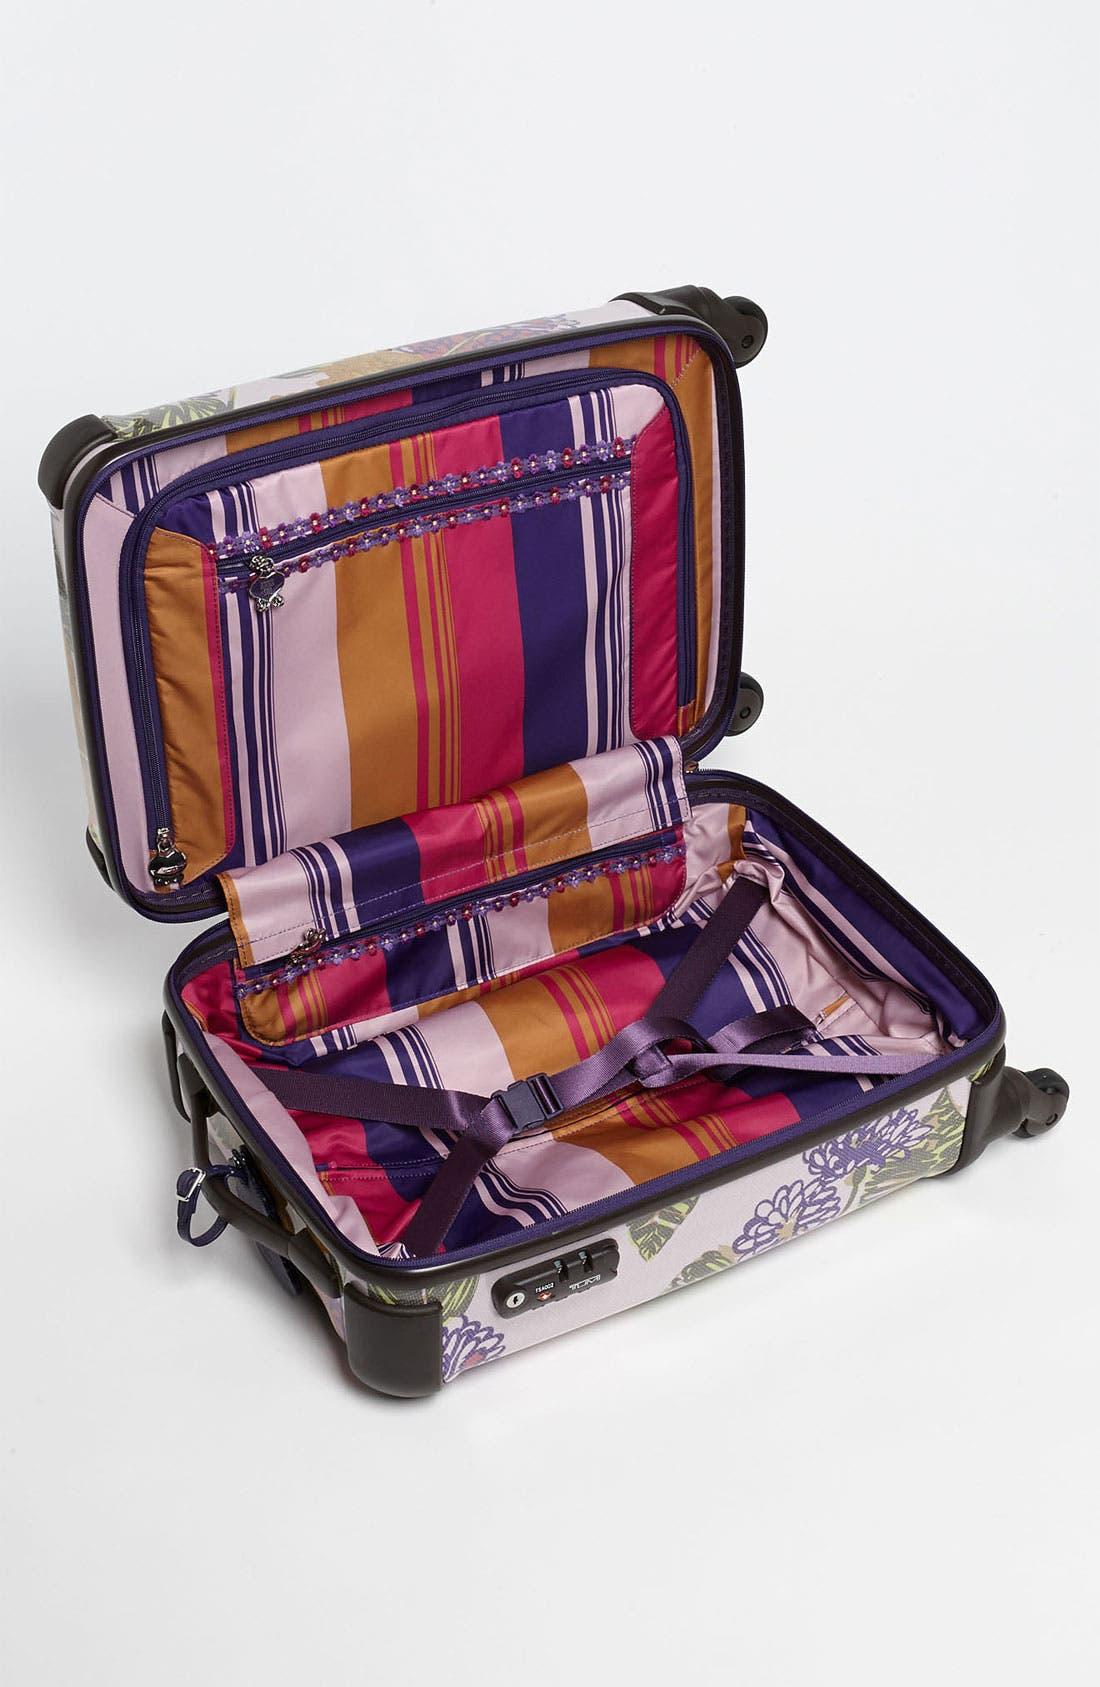 Alternate Image 3  - Tumi 'Vapor™ - Anna Sui' International Carry-On Bag